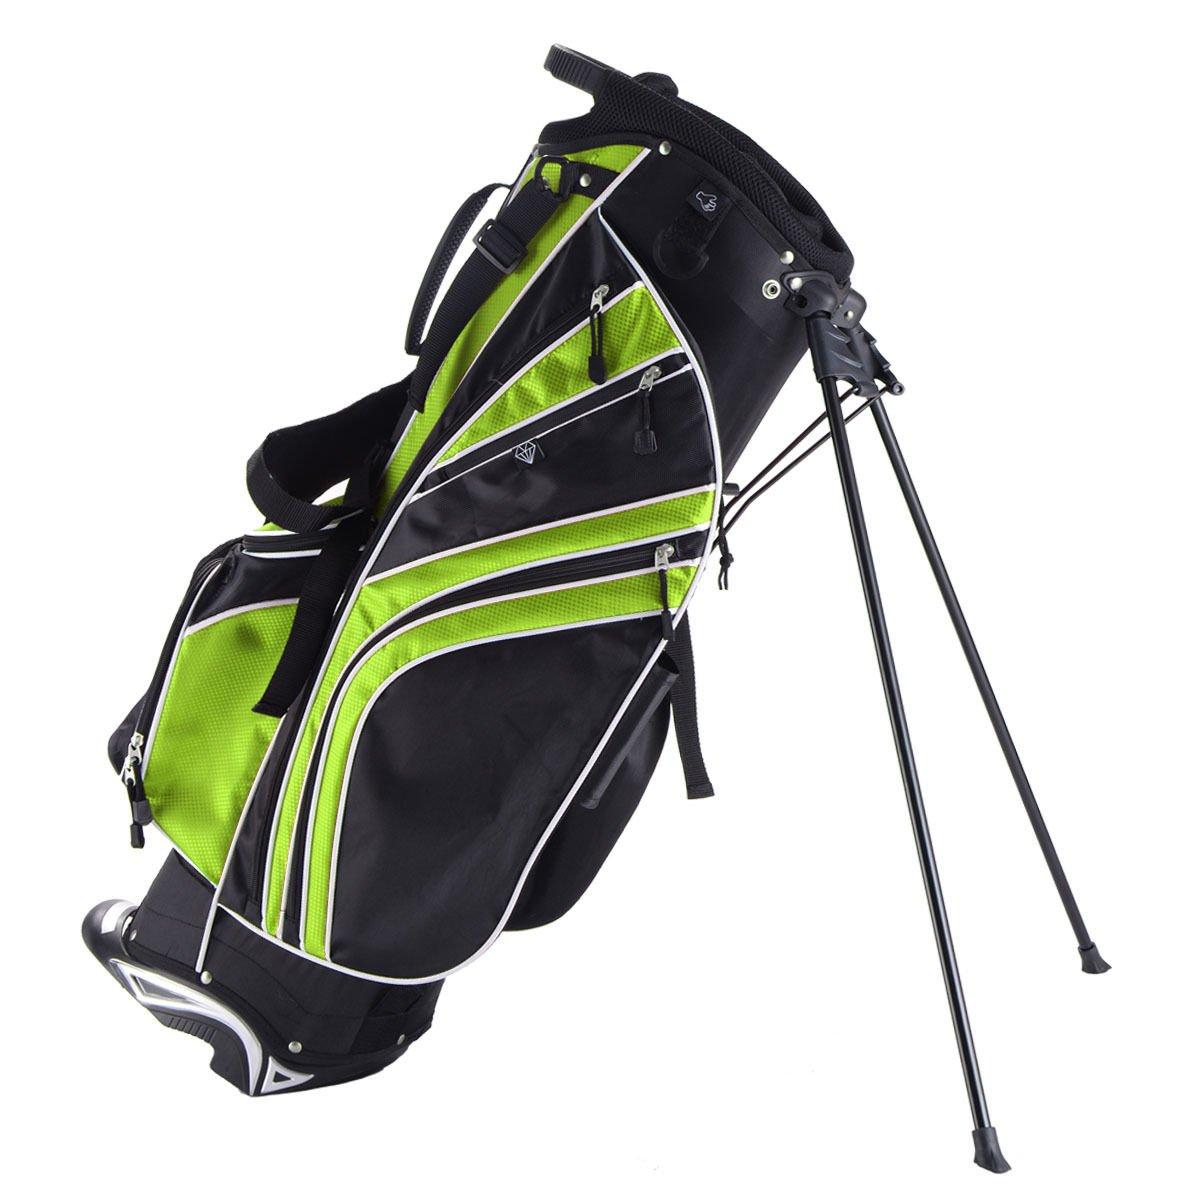 Tangkula Golf Stand Bag w/6 Way Divider Carry Organizer Pockets Storage Sunday Golf Bag(Green)